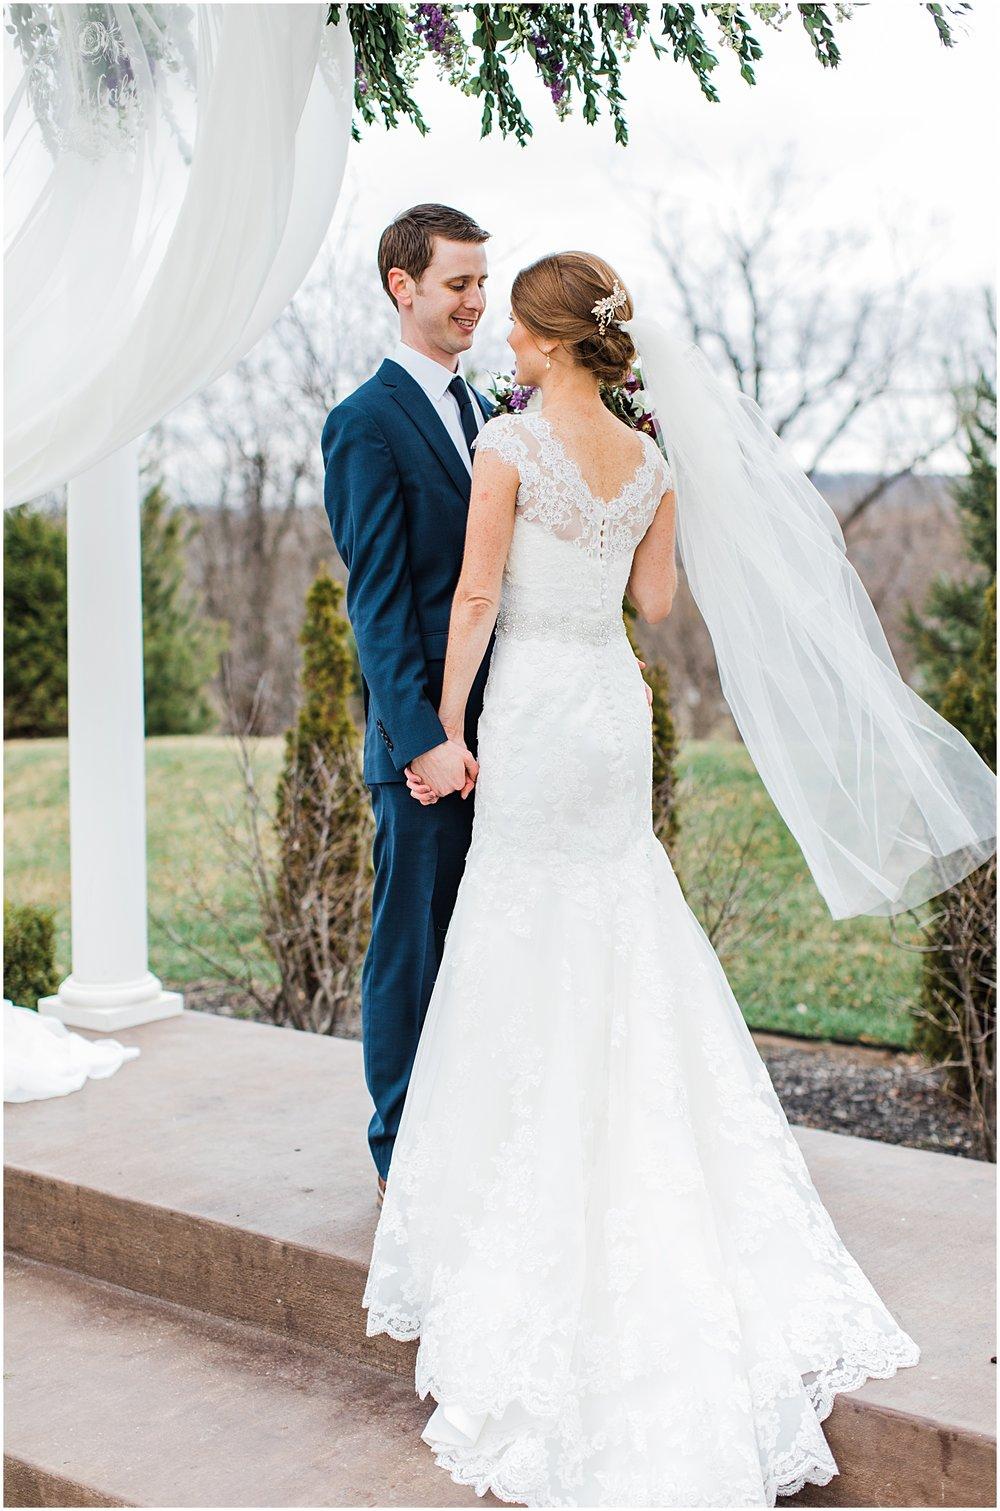 JACOBI WEDDING | 1890 EVENT SPACE | MARISSA CRIBBS PHOTOGRAPHY_4293.jpg